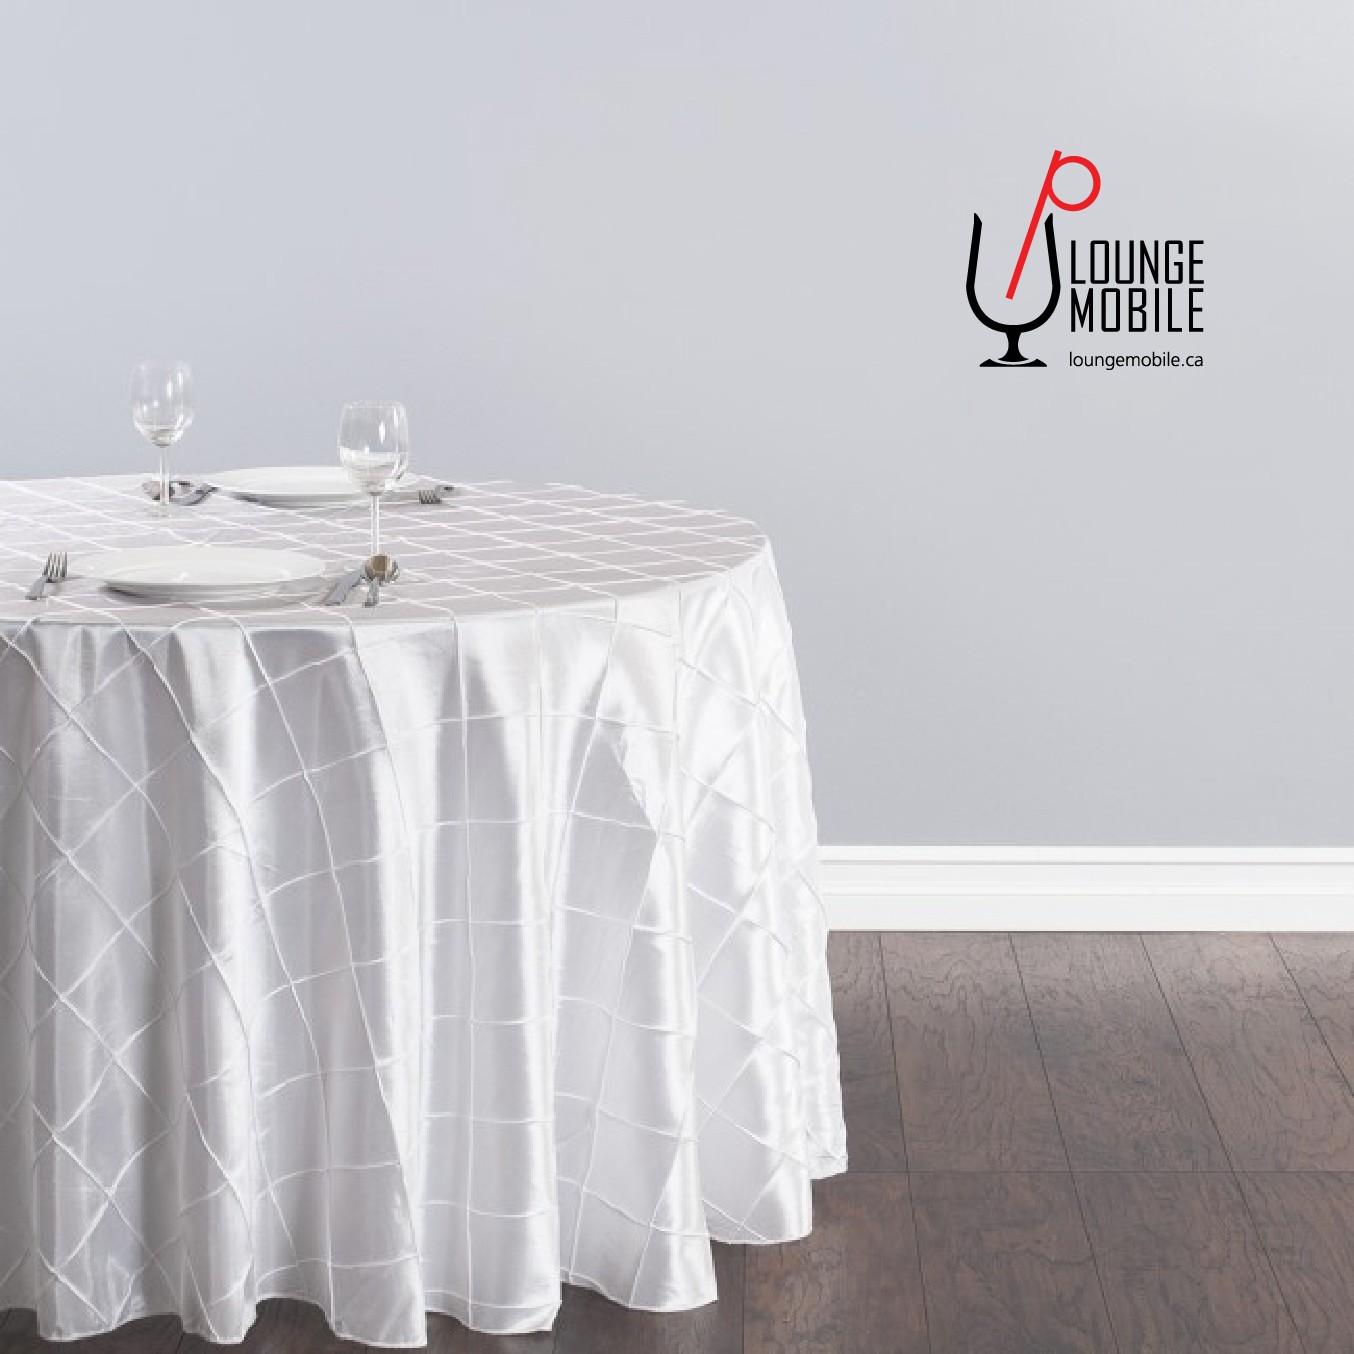 nappe ronde 108 39 39 taffeta carrel blanche nappes rondes. Black Bedroom Furniture Sets. Home Design Ideas